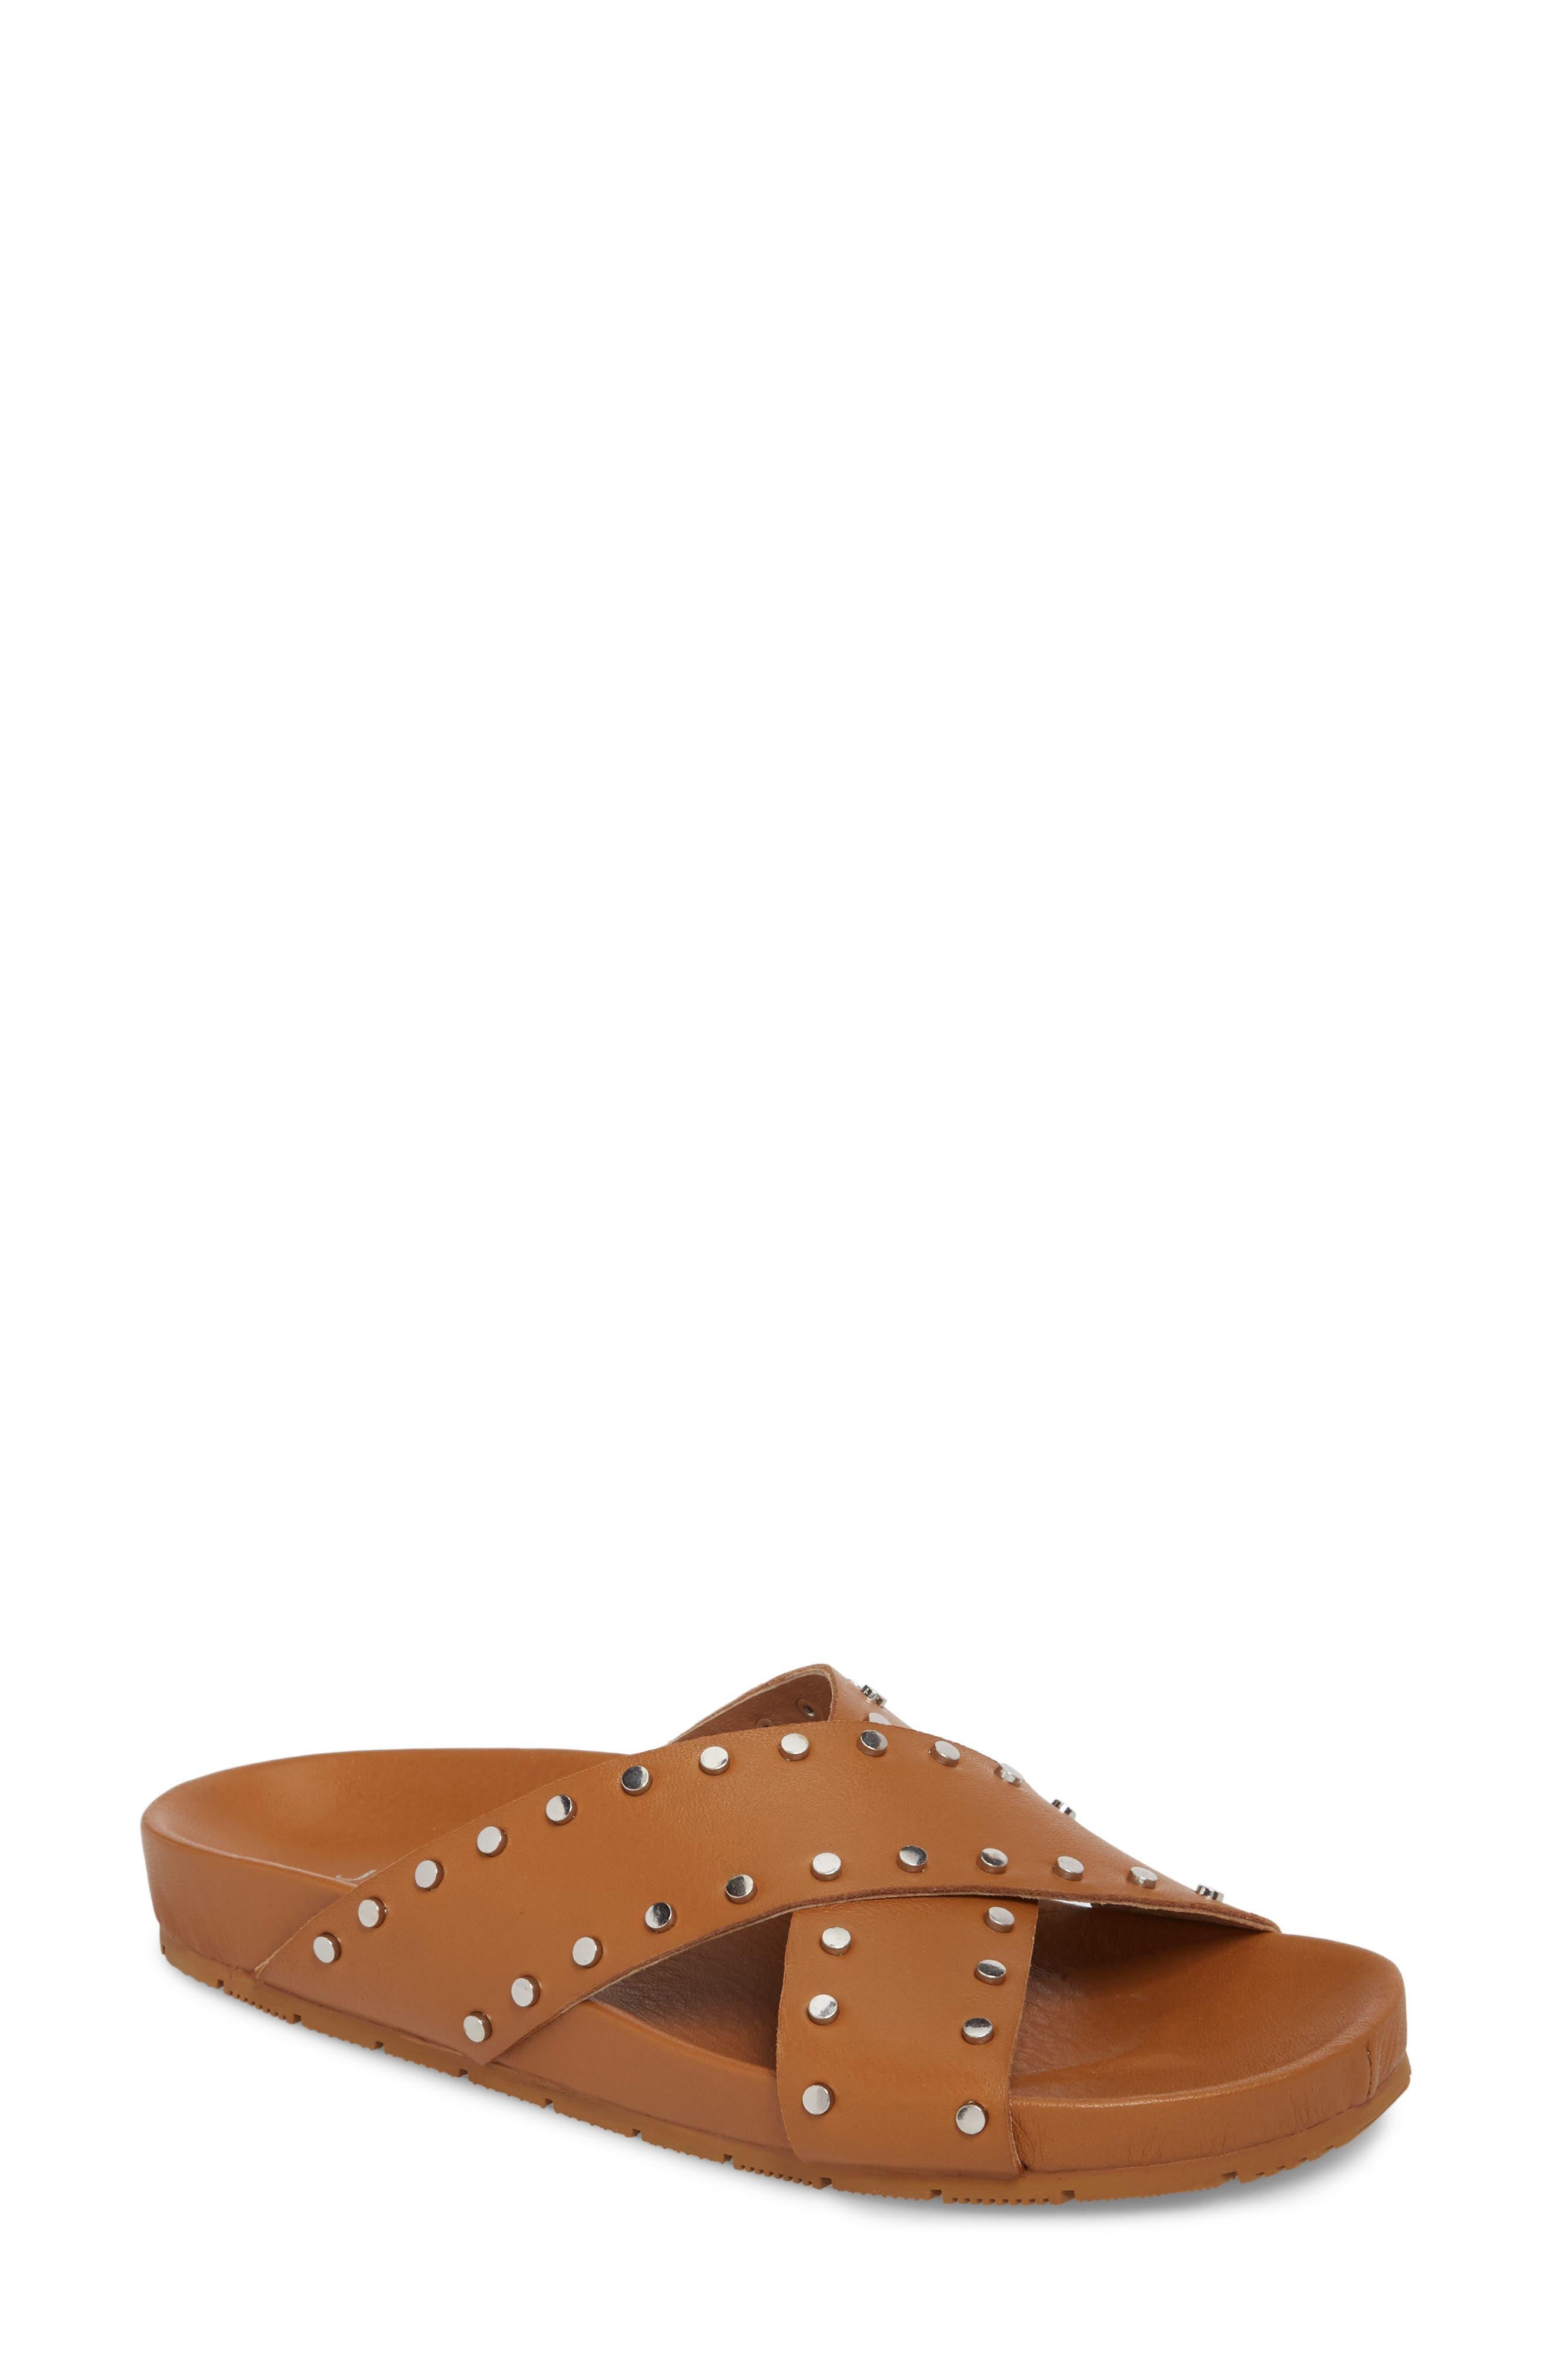 Ellie Studded Slide Sandal,                             Main thumbnail 1, color,                             Tan Leather